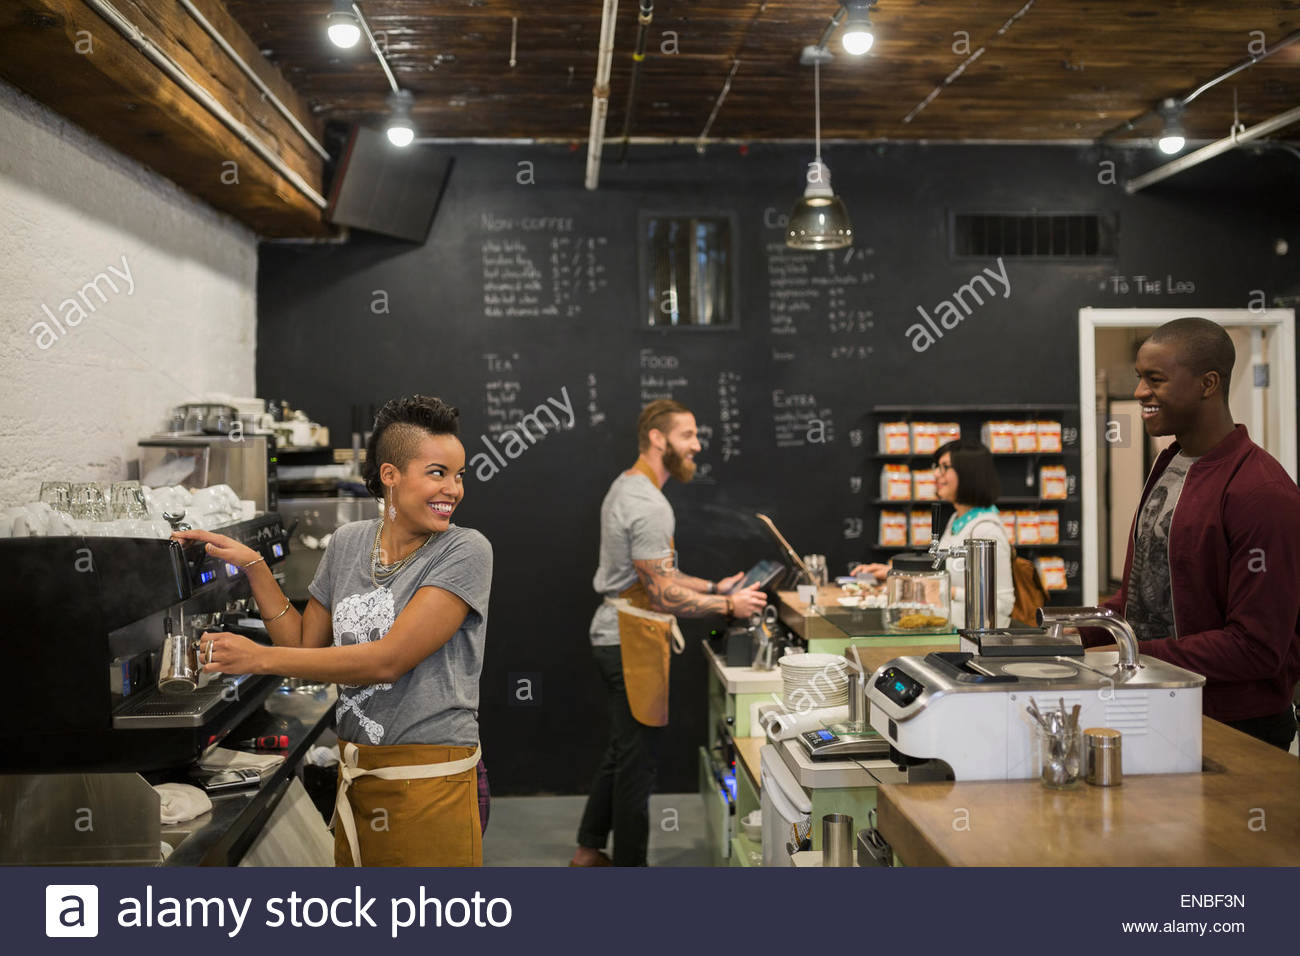 Baristas serving customers in coffee shop - Stock Image